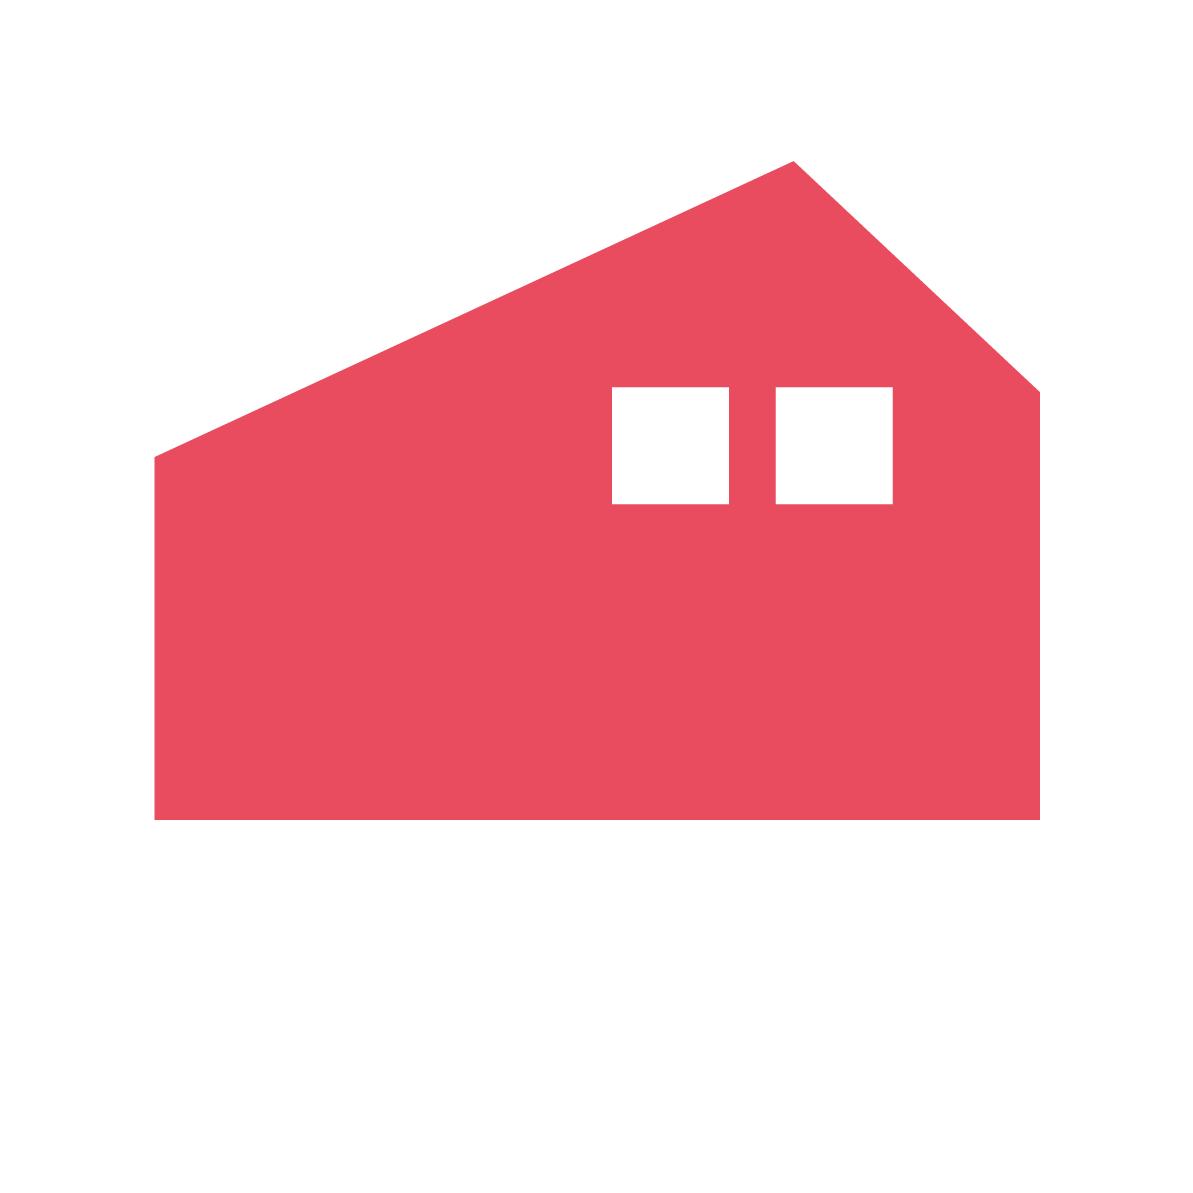 Taberunomo House